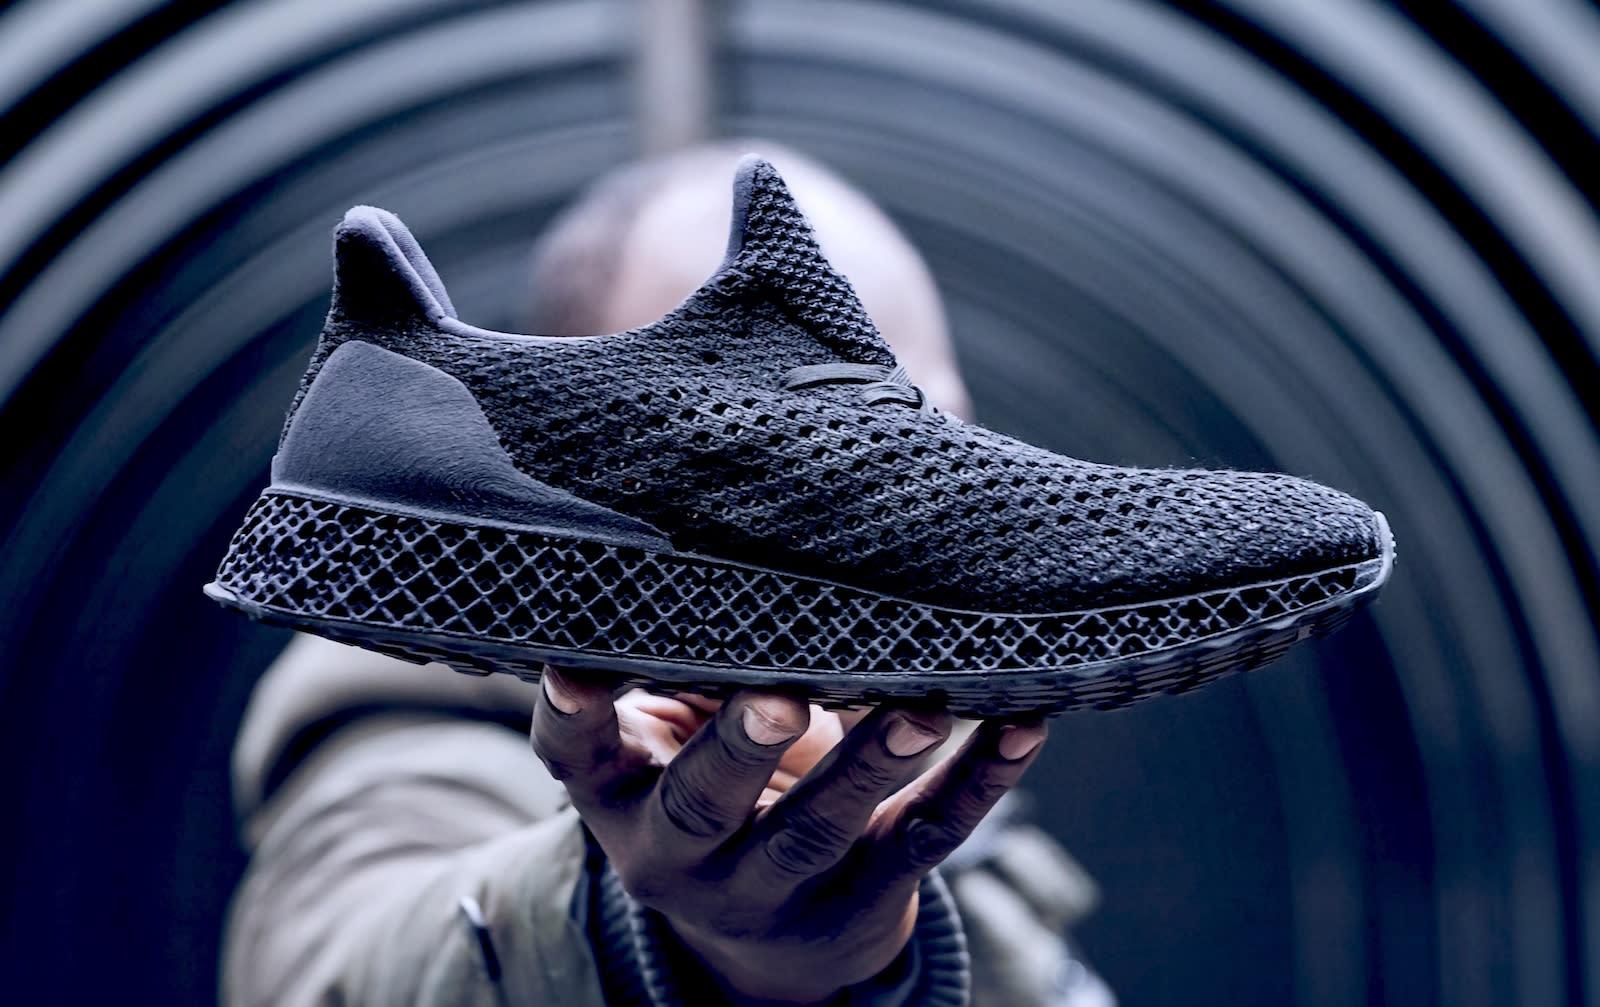 Adidas' latest 3D-printed running shoe